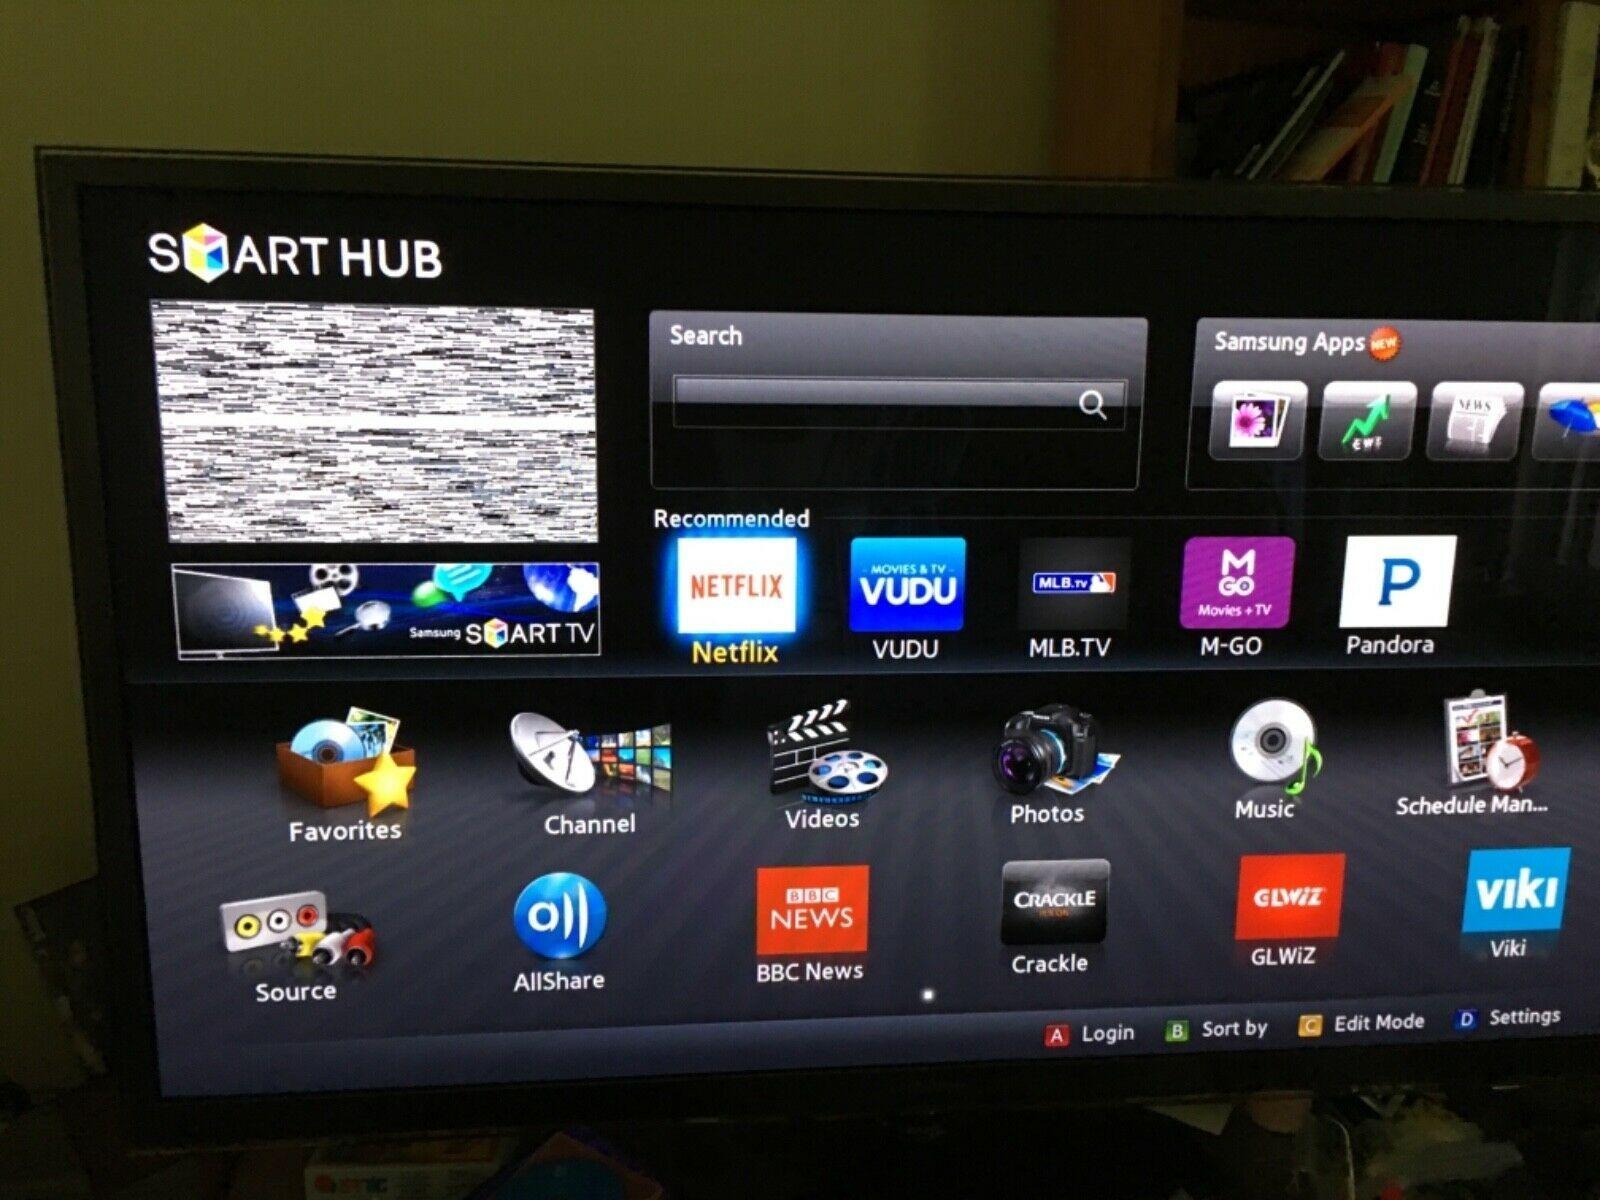 Samsung PLASMA Smart TV 65 4k Smart TV Ideas of Smart